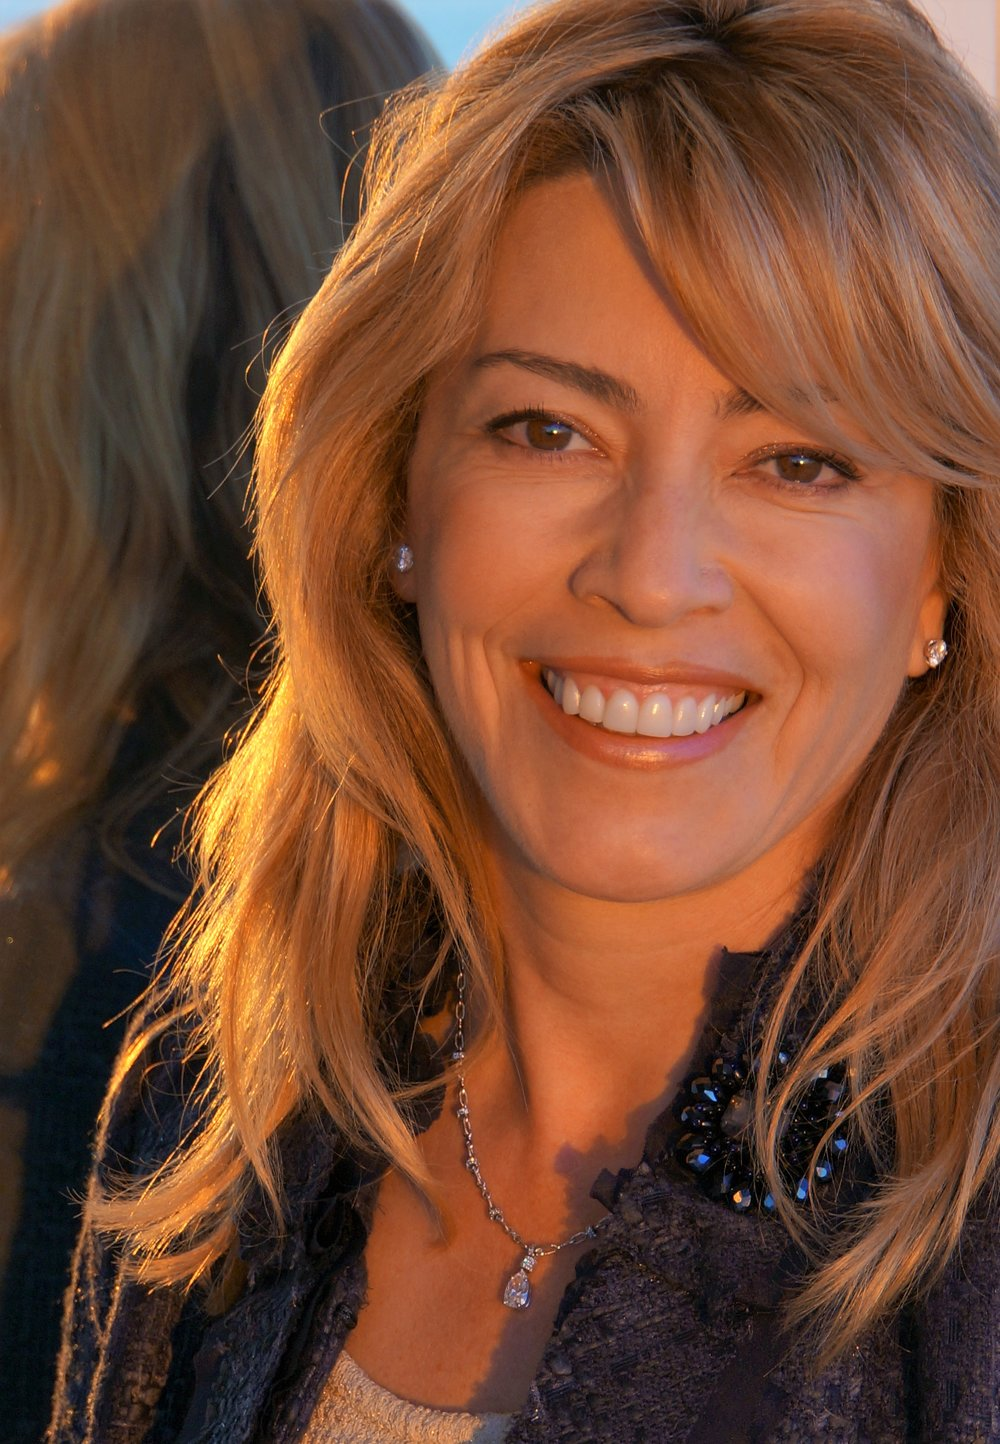 Bibi horacek - board member